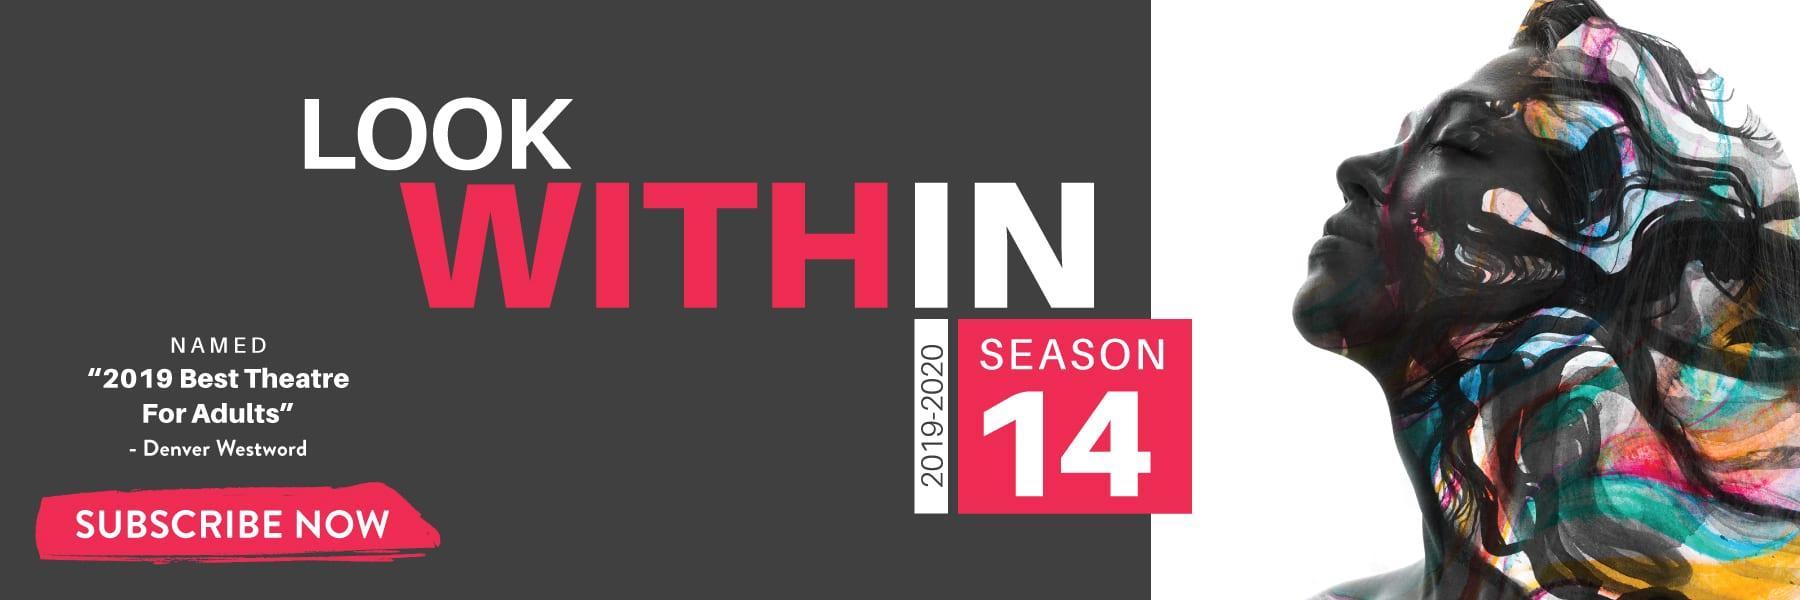 BETC Season 14 Look Within